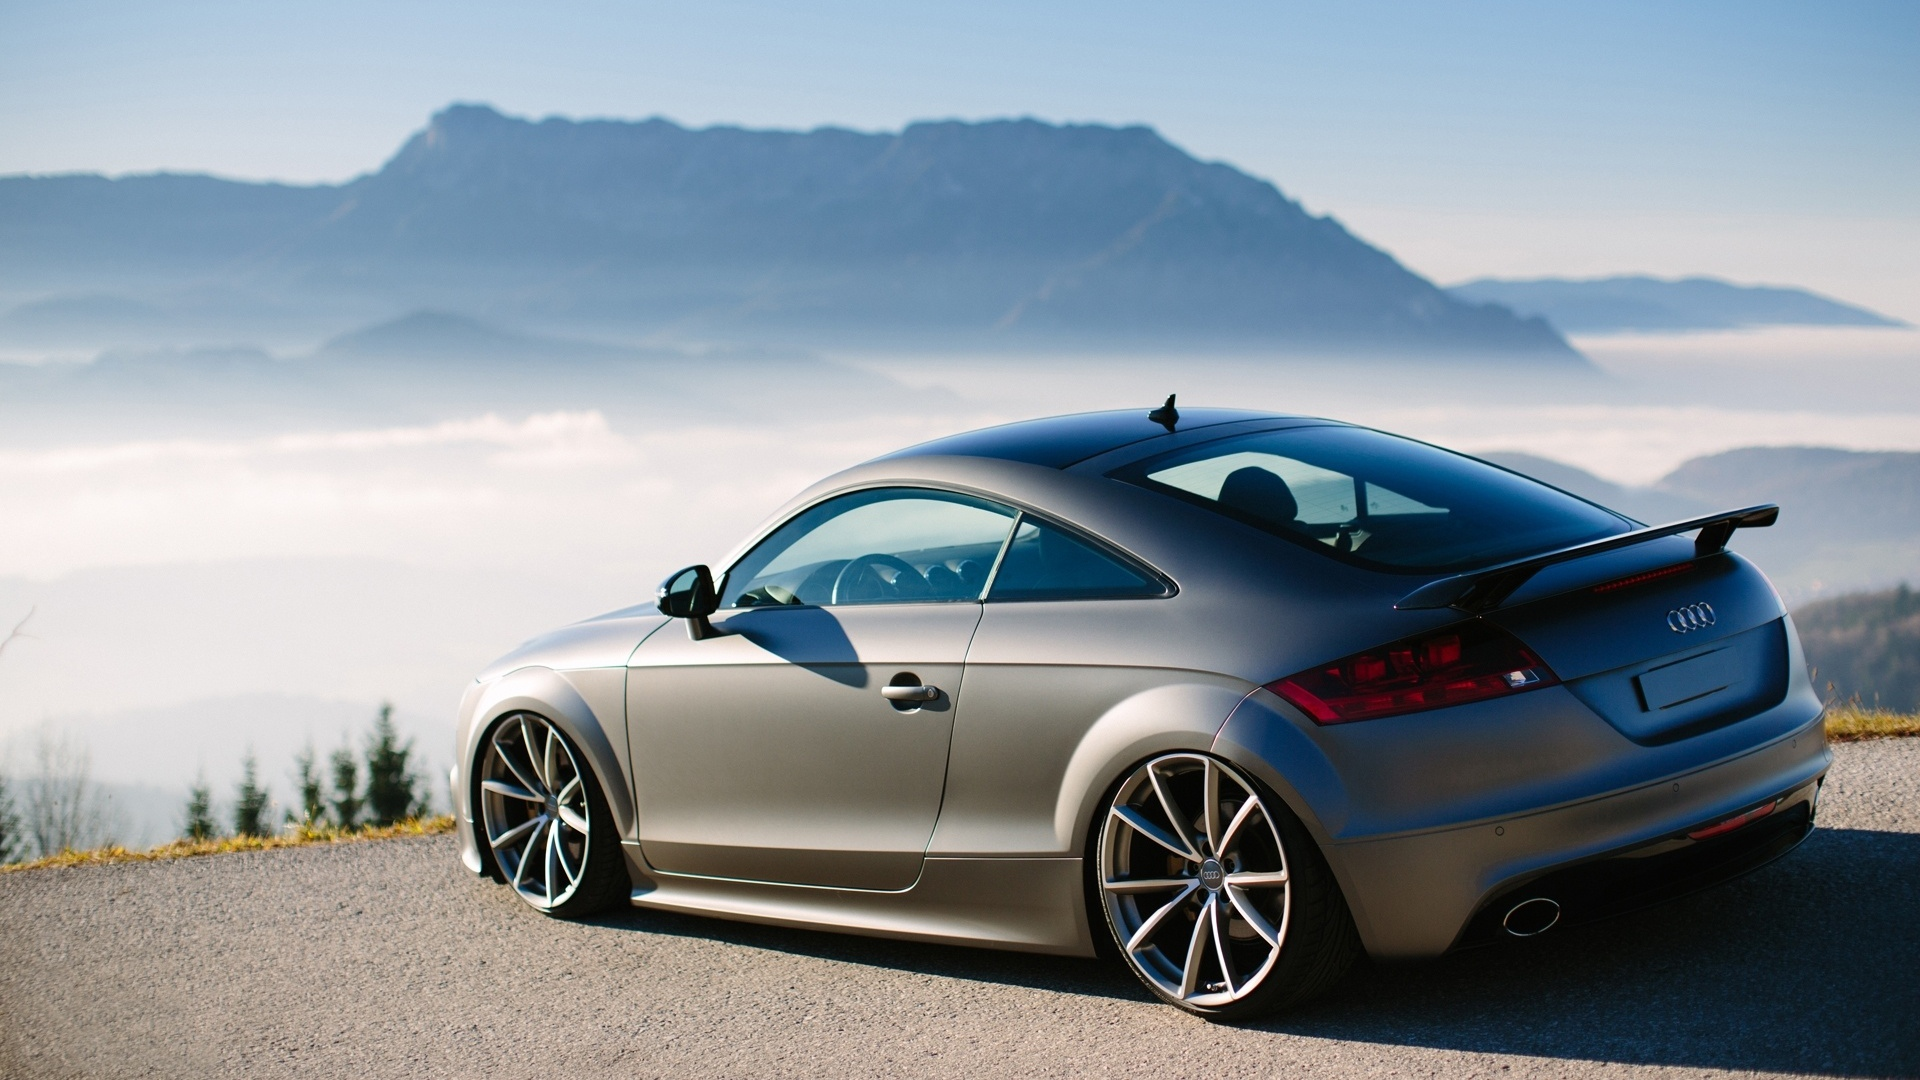 Audi R8 Hd Widescreen Wallpapers 1080p Download Wallpaper 1920x1080 Audi Tt Austria Fog Tuning